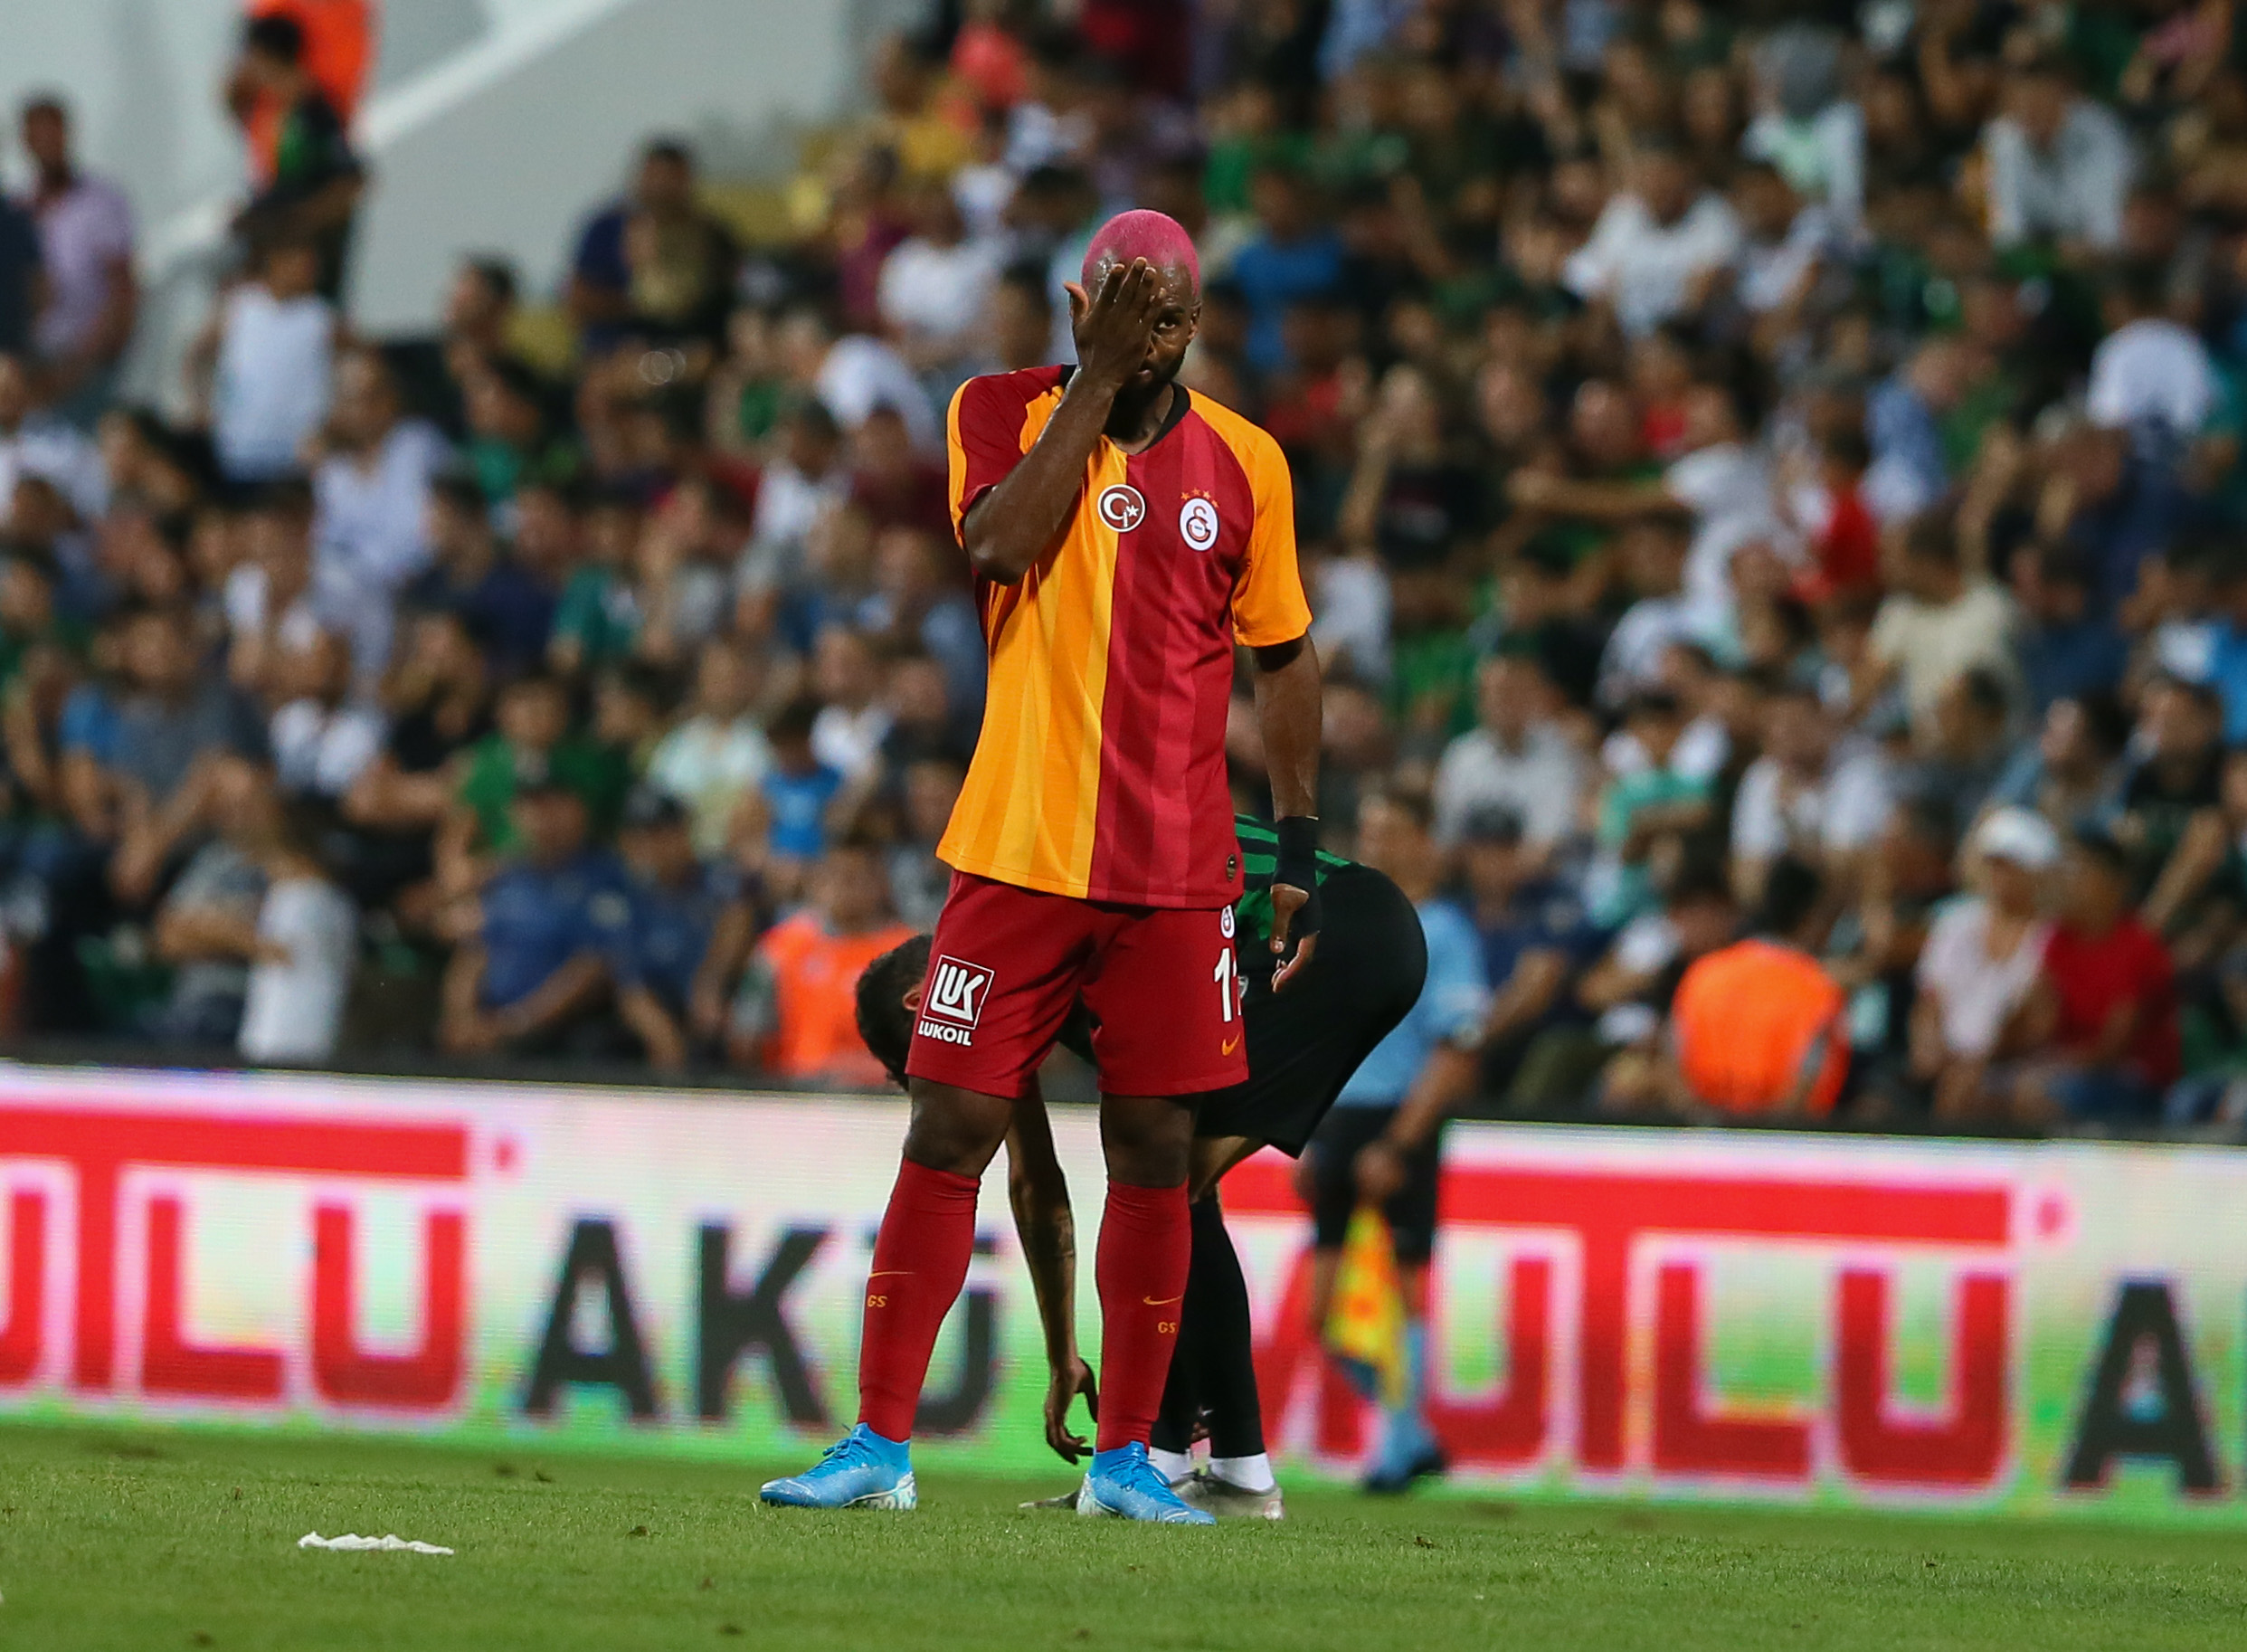 Galatasaray'da kamp kadrosuna alınmayacak isimler #1